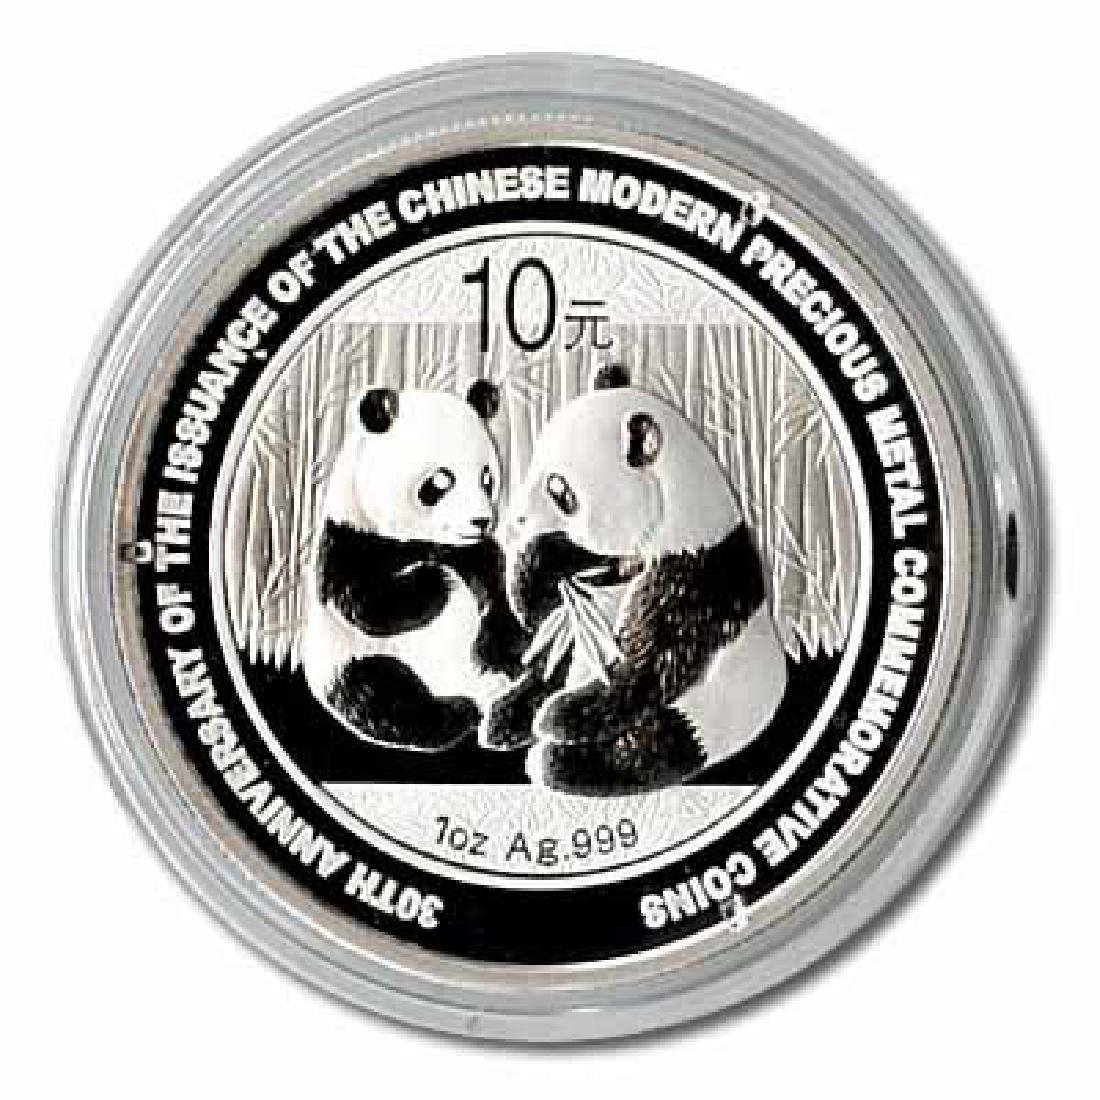 2009 Chinese Silver Panda 1 oz - 30th Anniversary